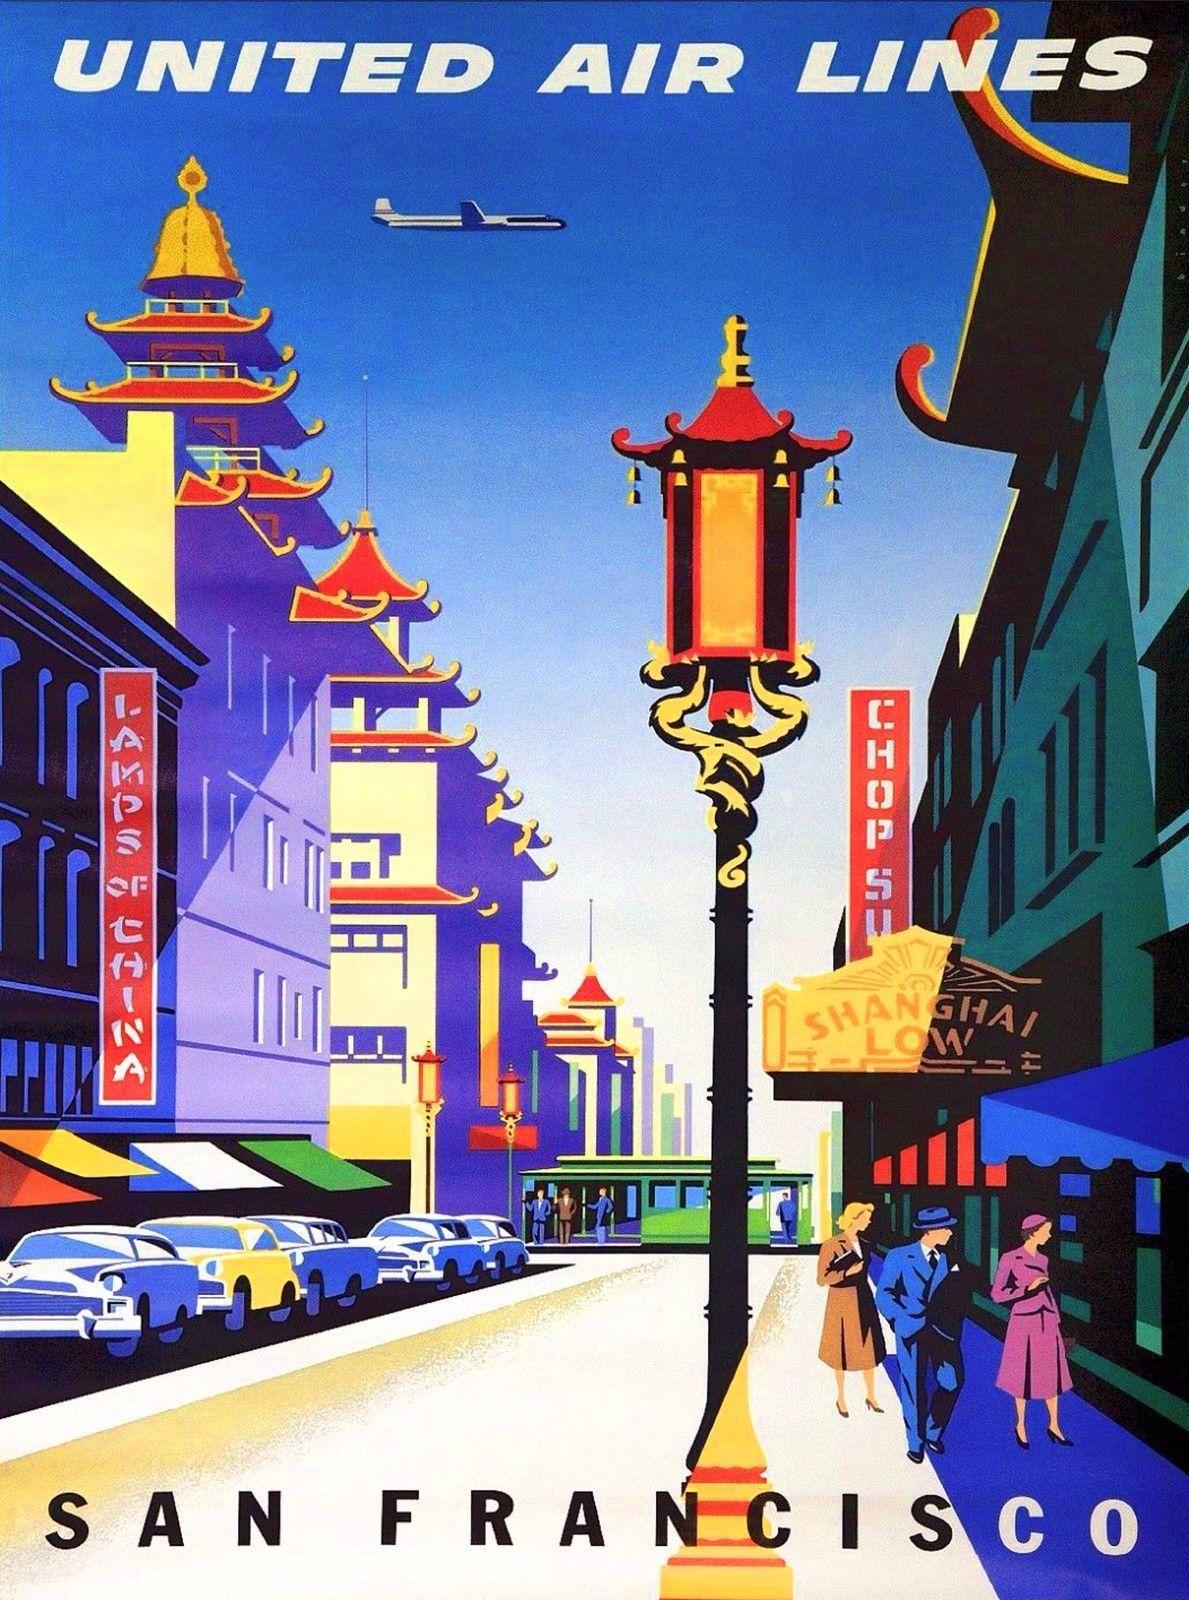 San Francisco California Air Vintage United States Travel Advertisement Poster